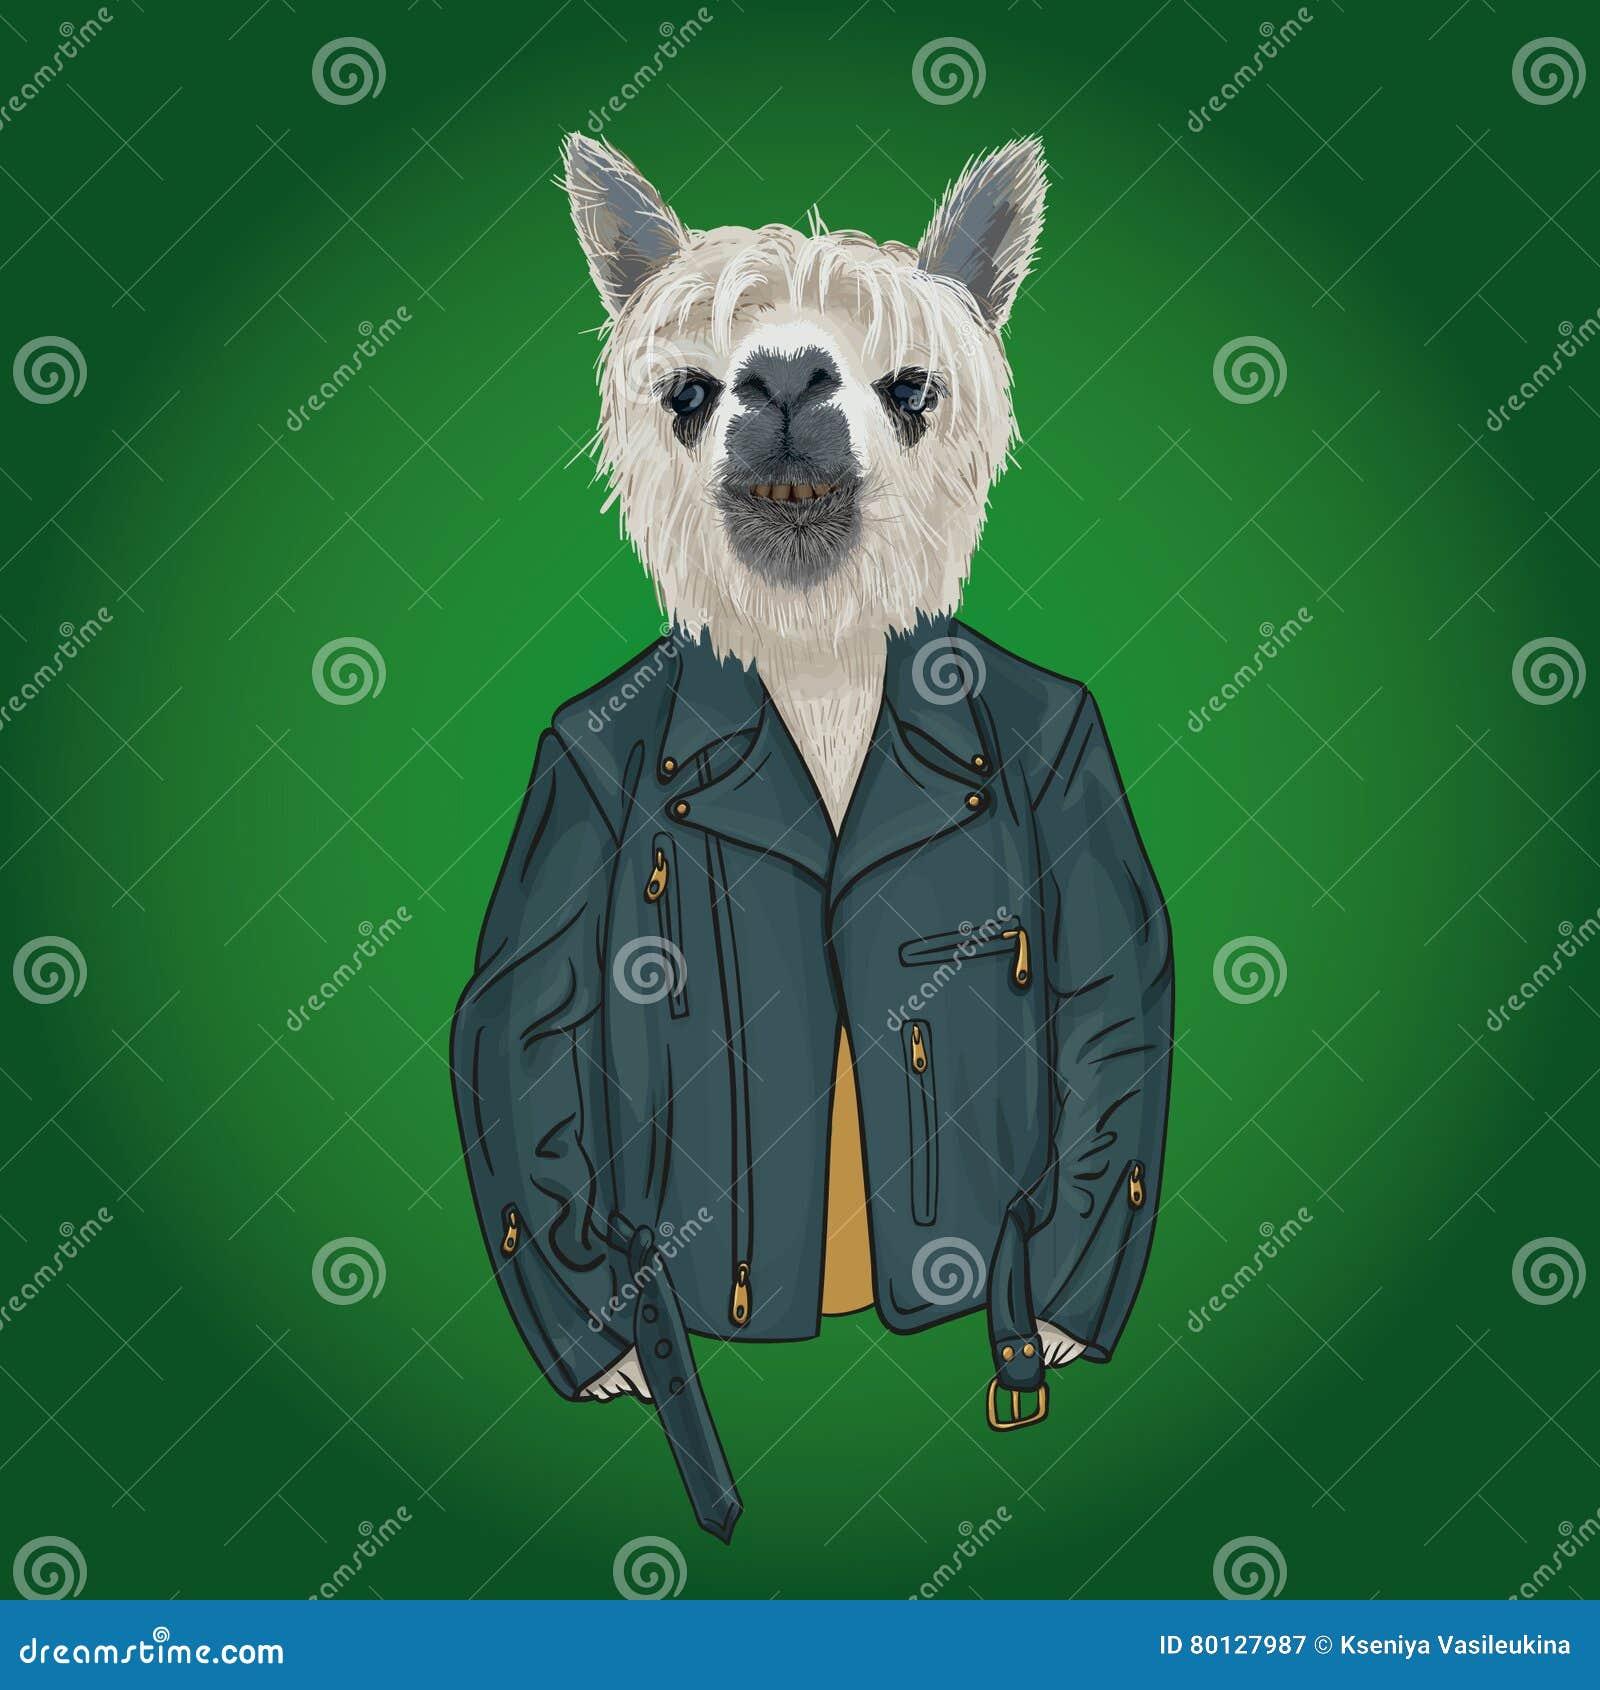 Lama teen wearing hoodie with print, furry art illustration,